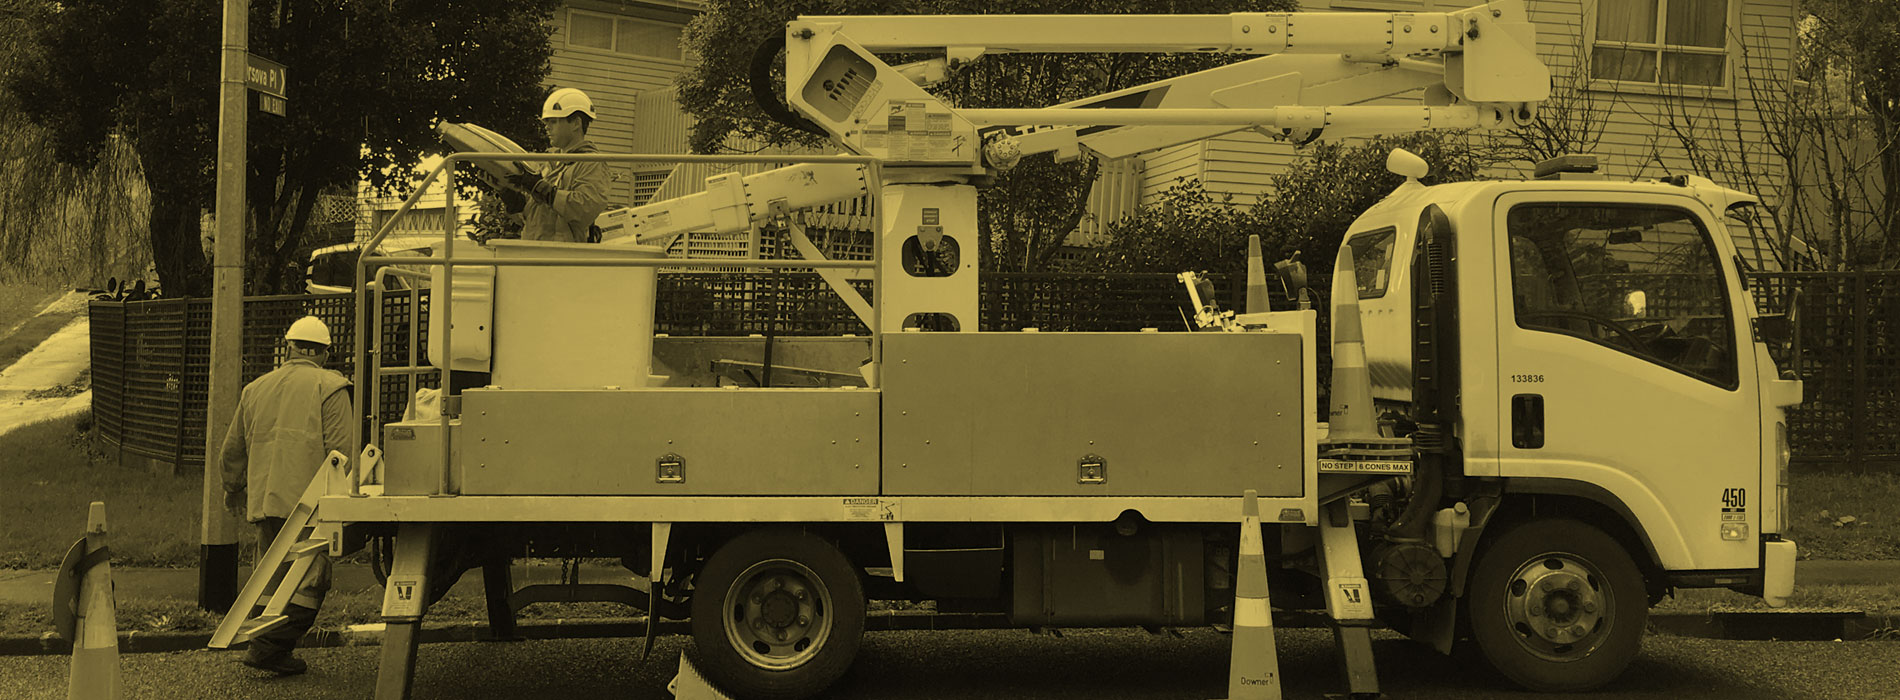 truck mount ewpa courses